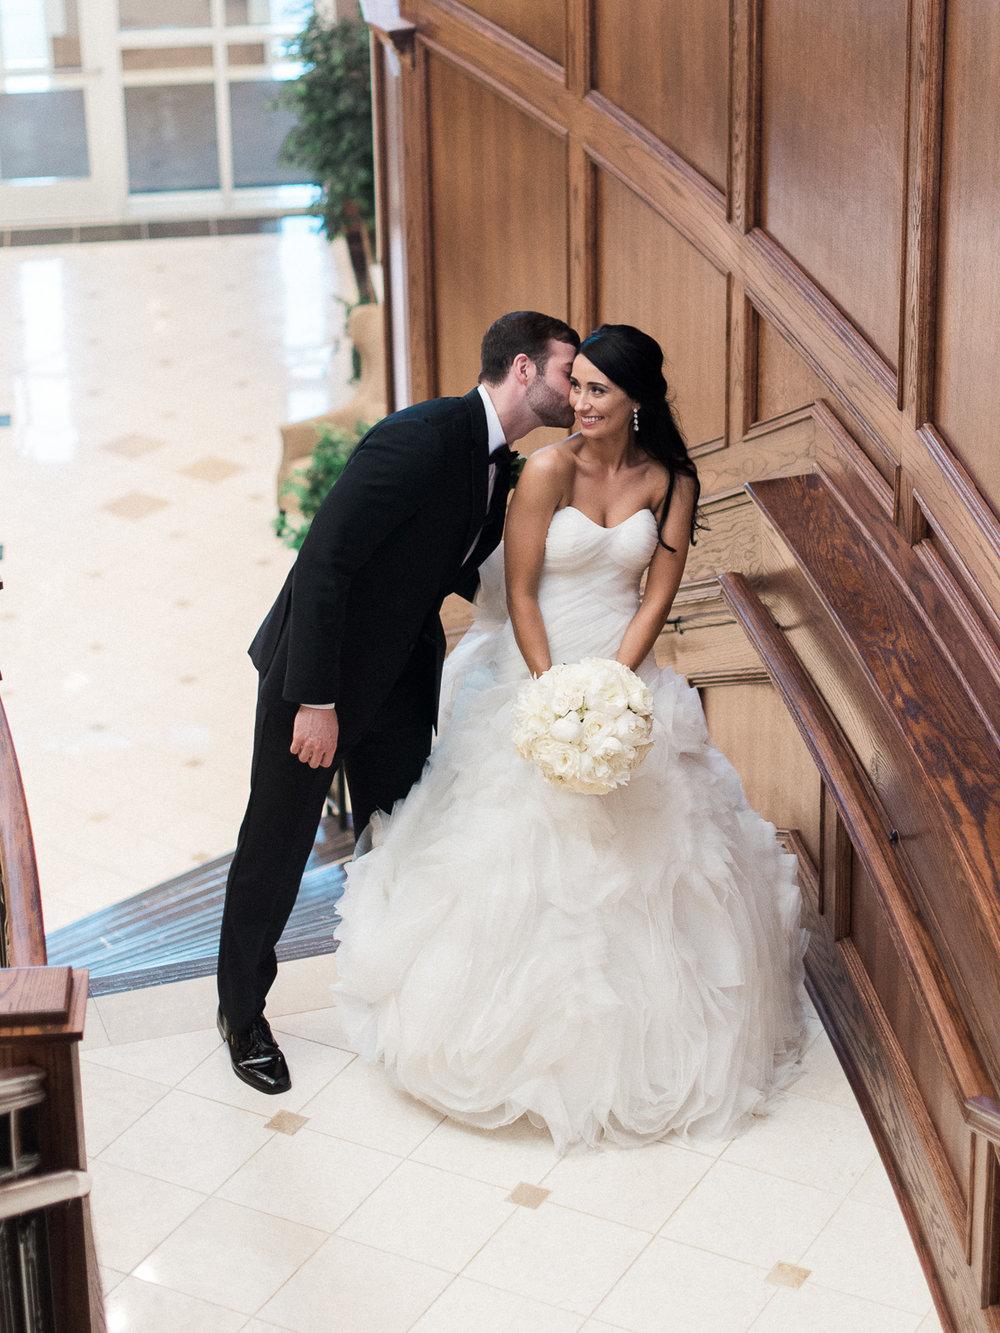 alexgreg-wedding-bridegroomdancing-christinadavisphoto26.jpg